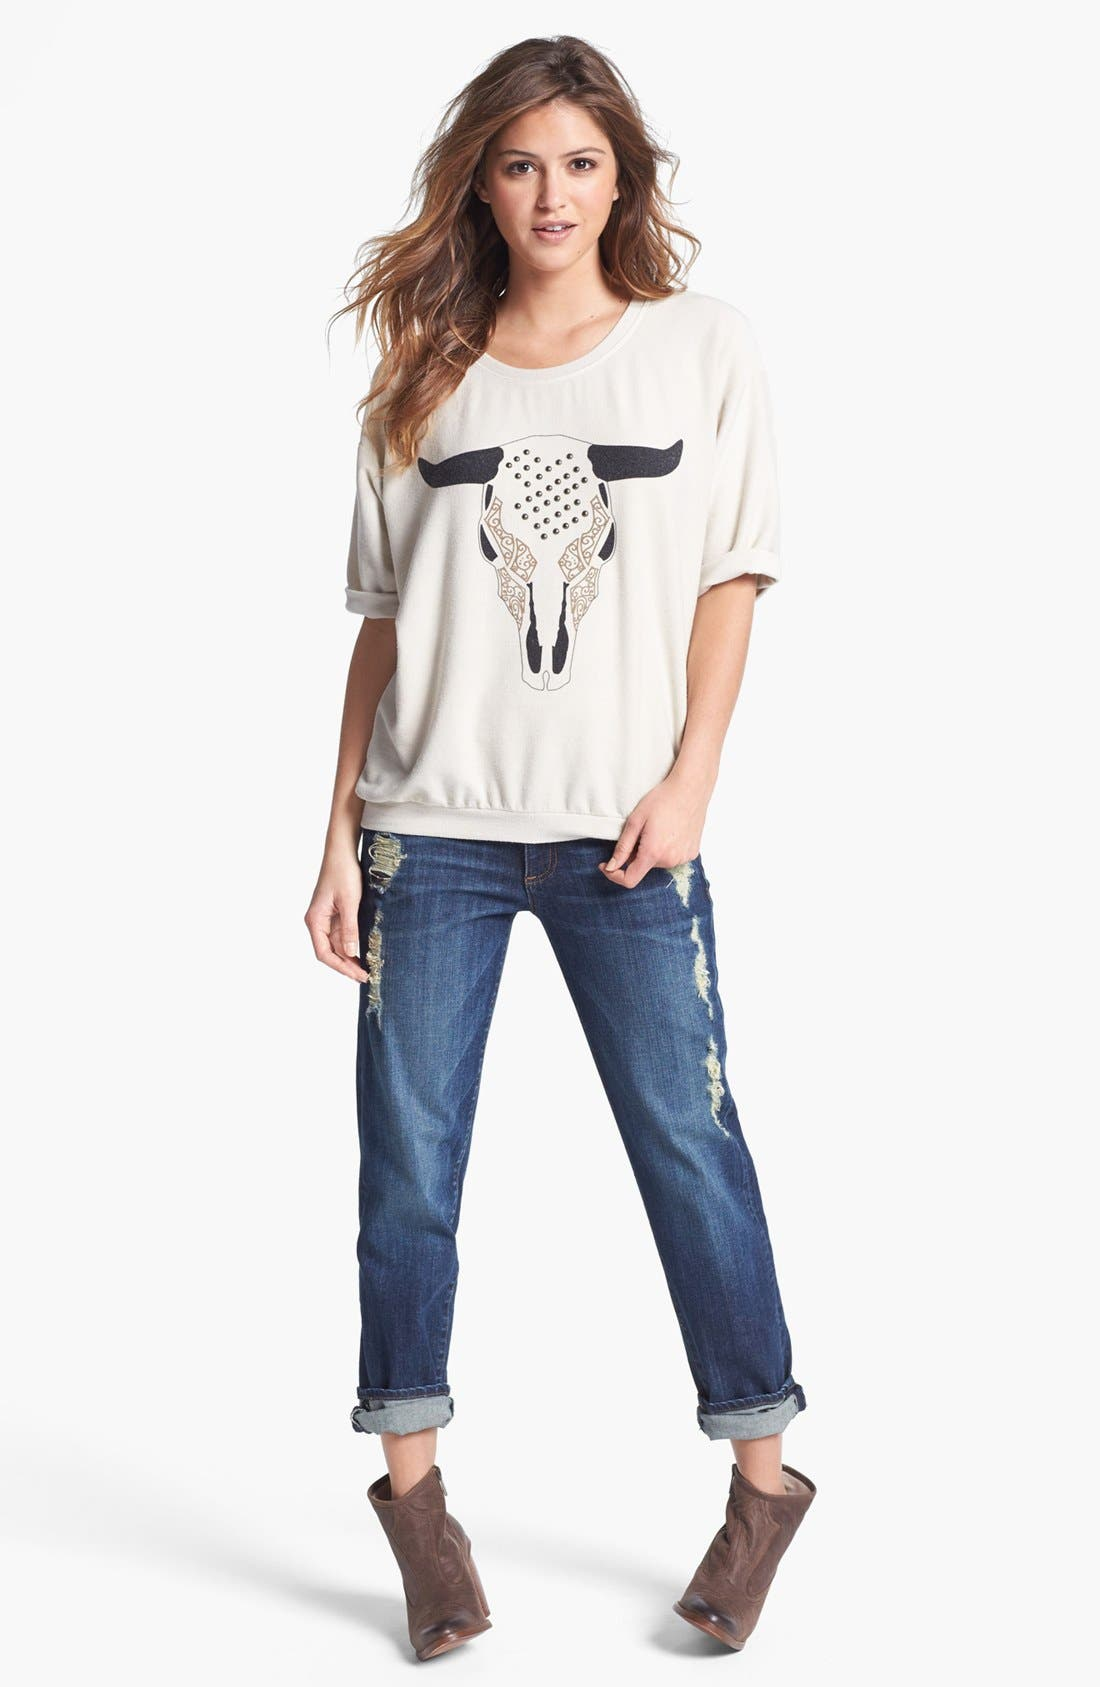 Main Image - Max & Mia Sweatshirt & KUT from the Kloth Boyfriend Jeans